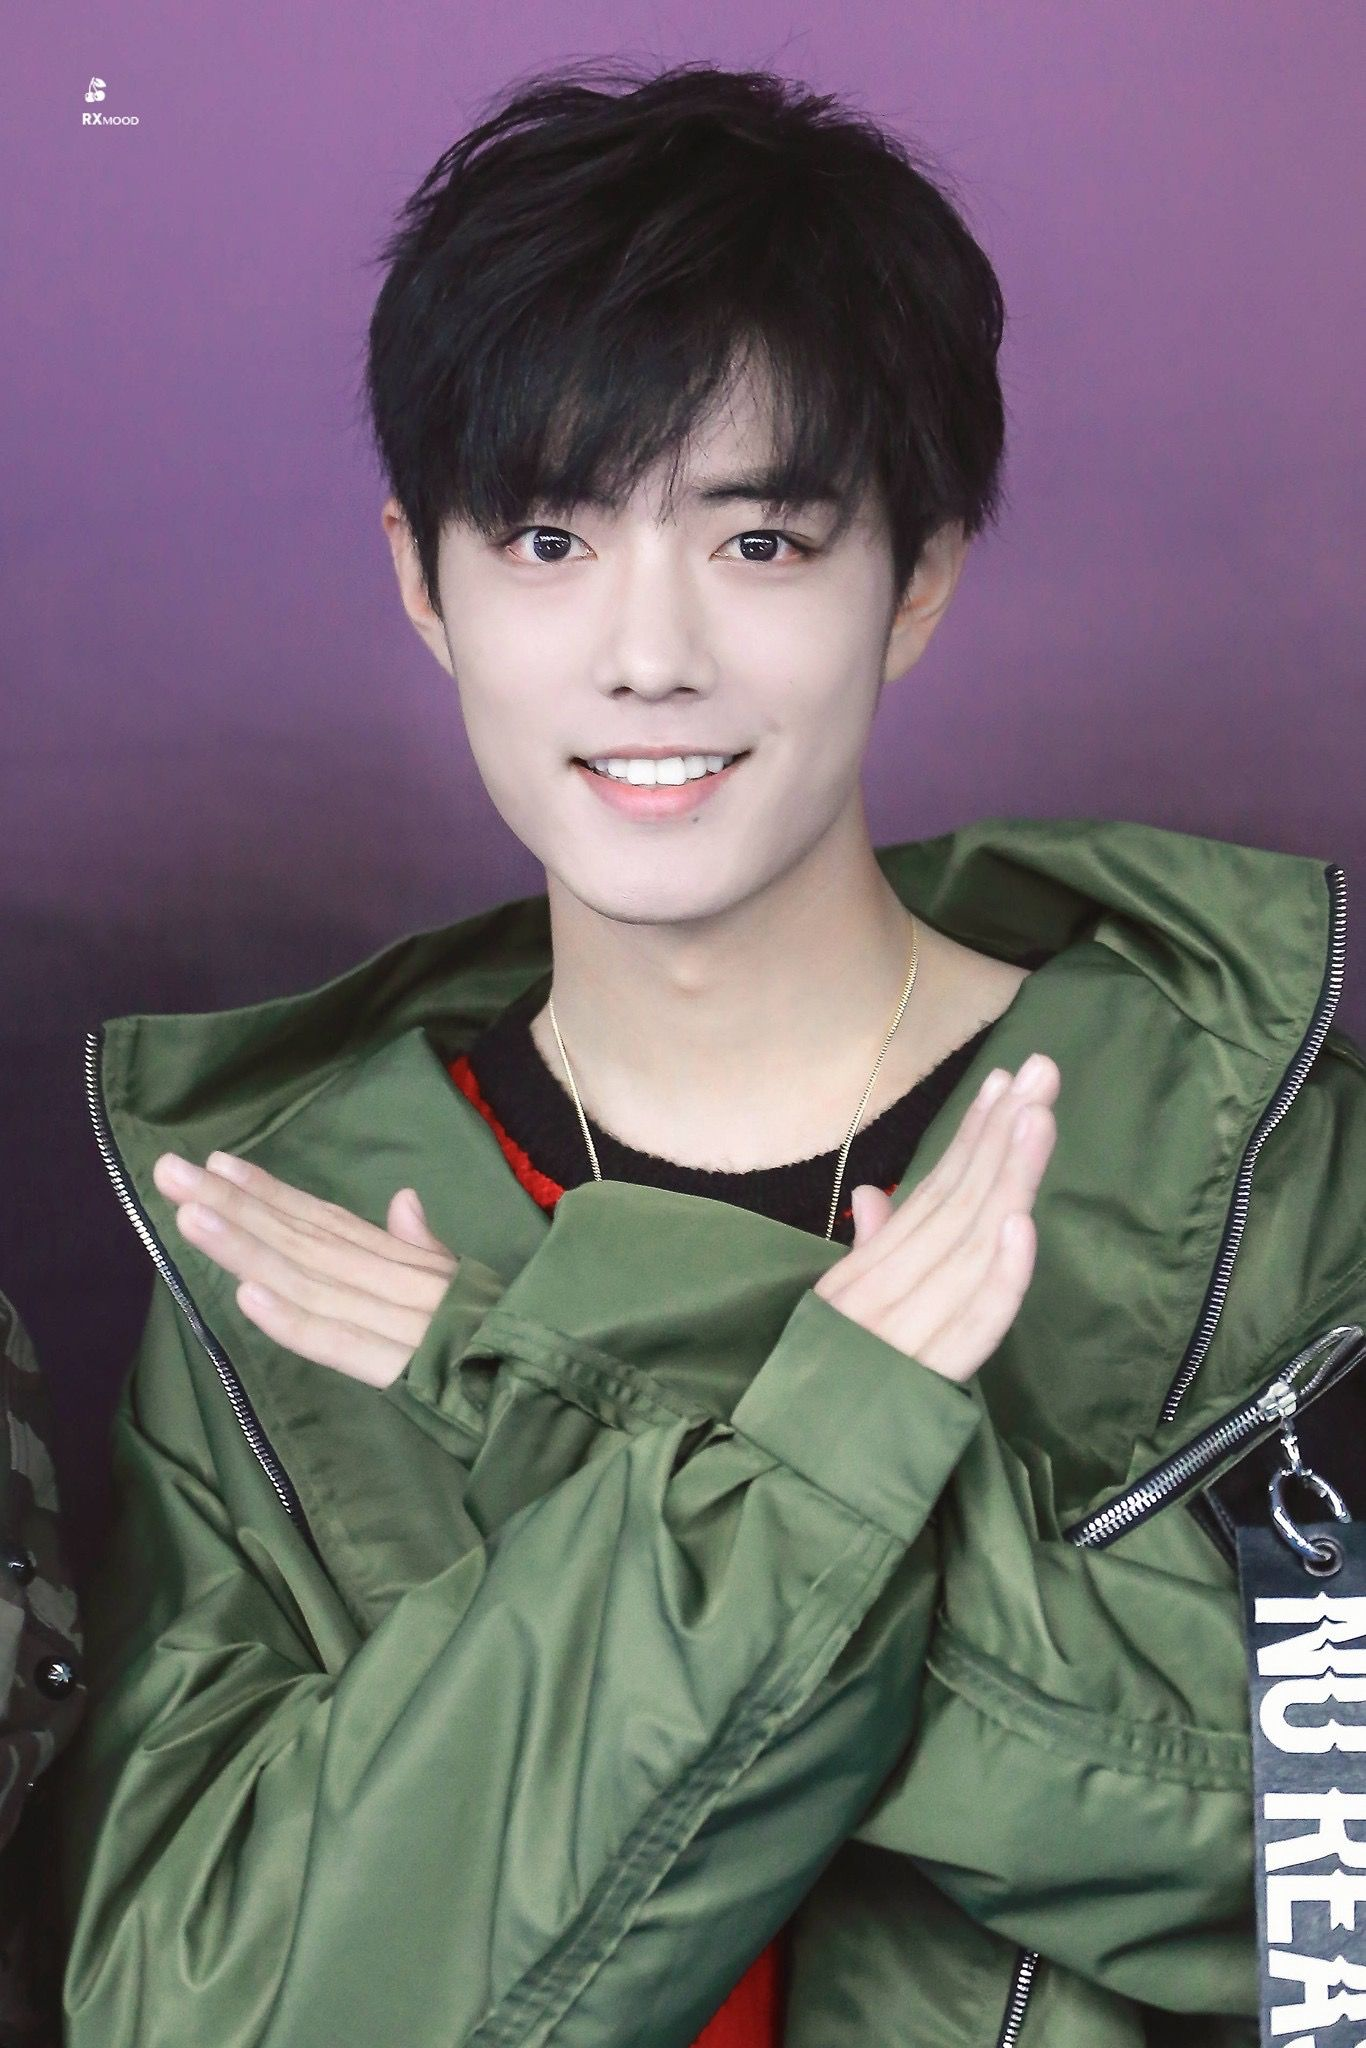 Ulzzang boy hairstyle pin by  on trai đẹp kìa  pinterest  idol boy groups and